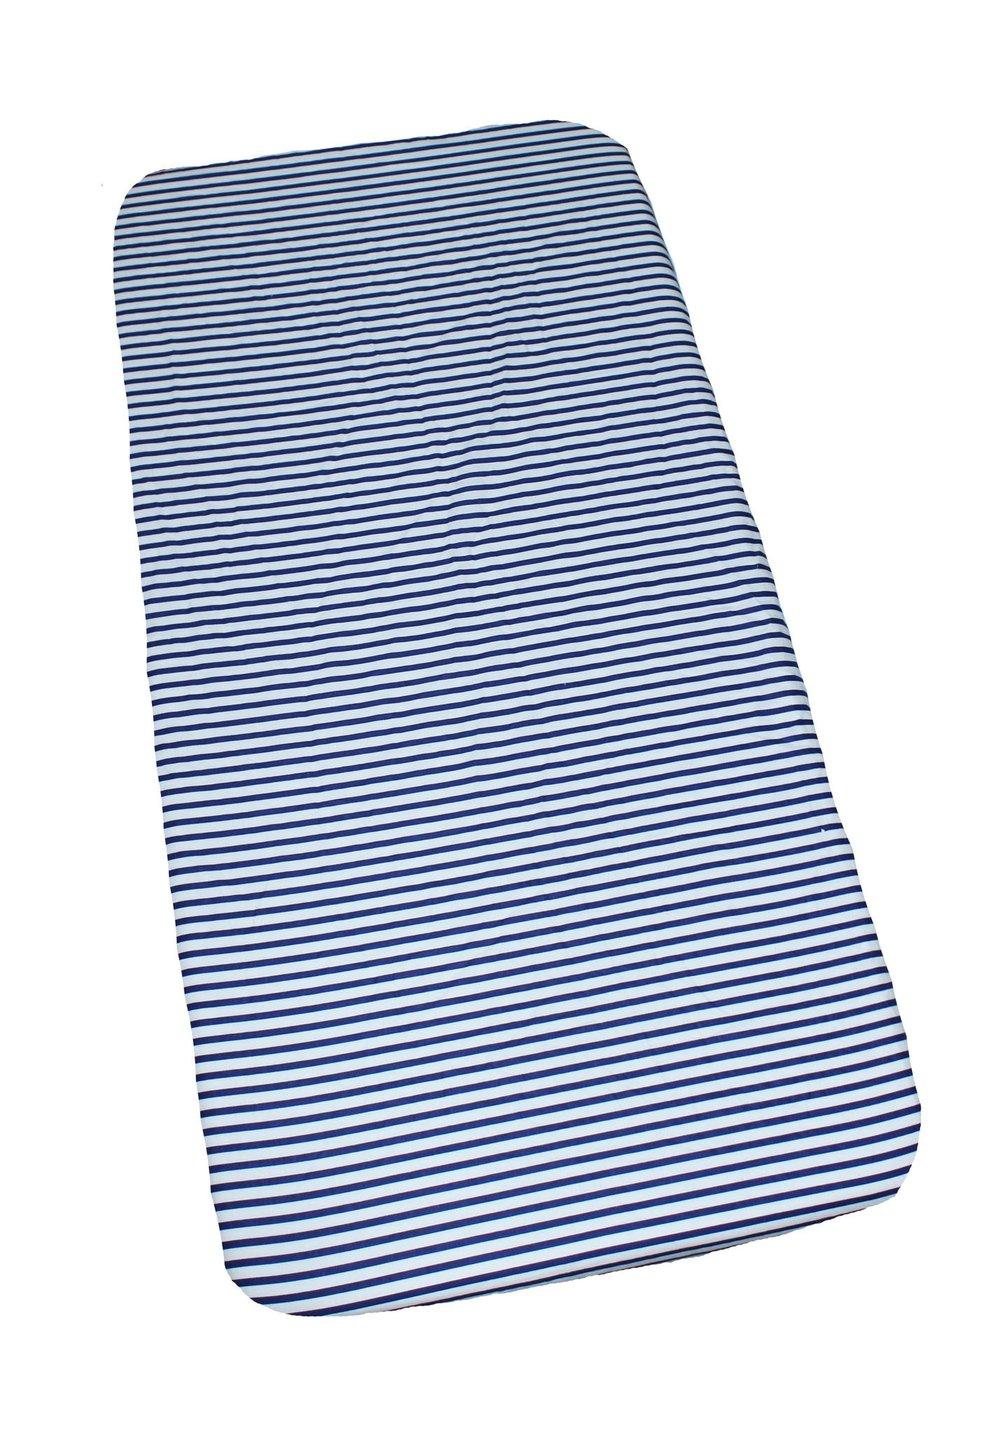 Cearceaf bumbac, alb cu dungi bluemarin, 120x60 cm imagine